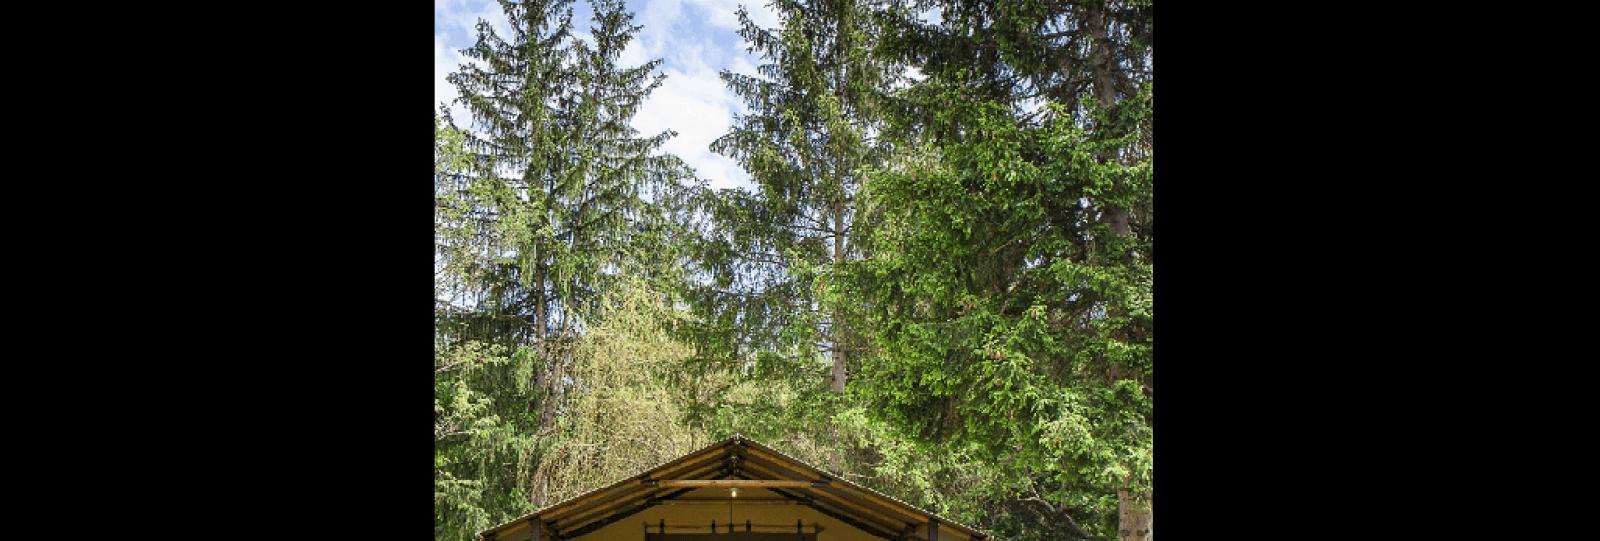 Tente Lodge 'Echirou' - Camping de la Clairette